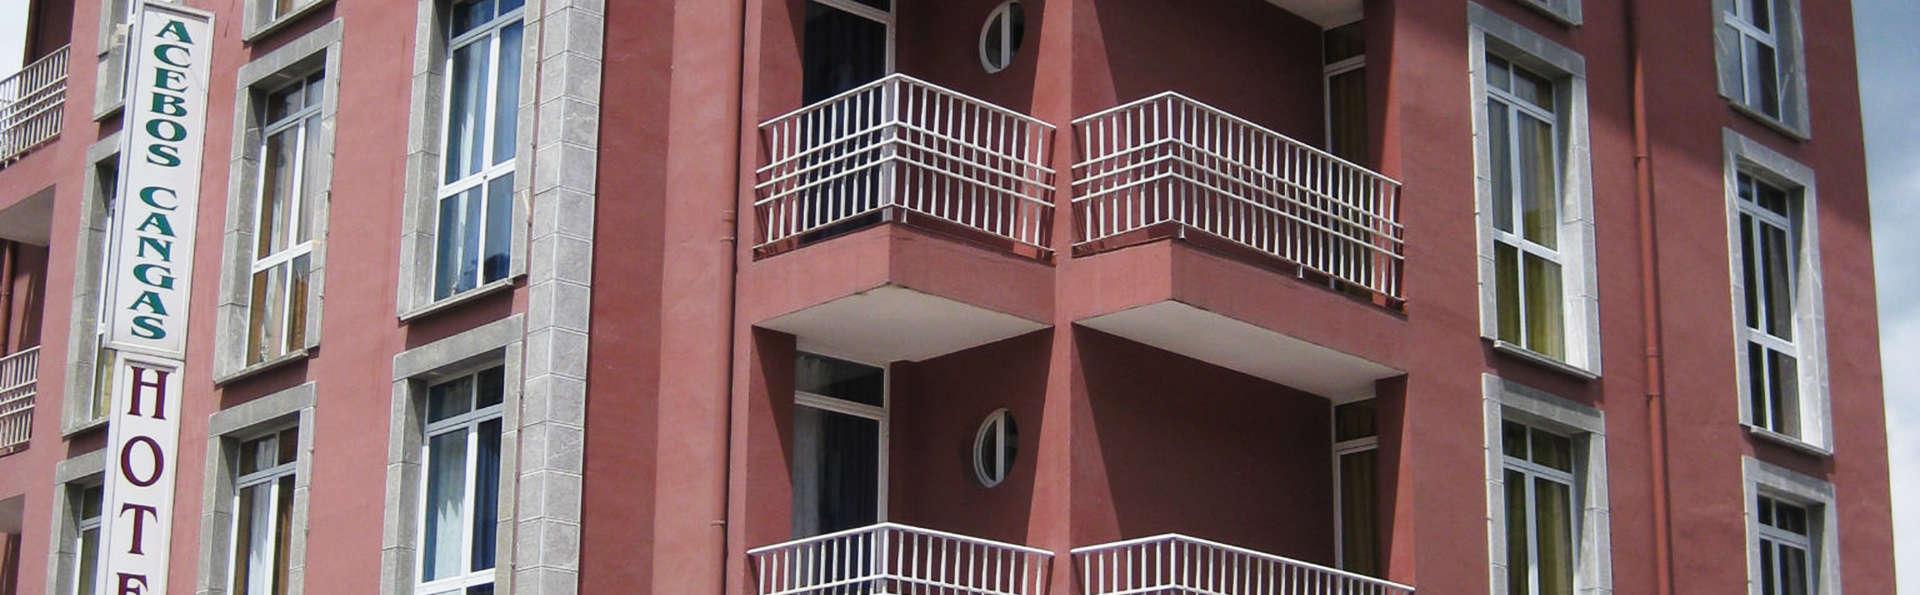 Hotel Los Acebos Cangas - EDIT_front1.jpg